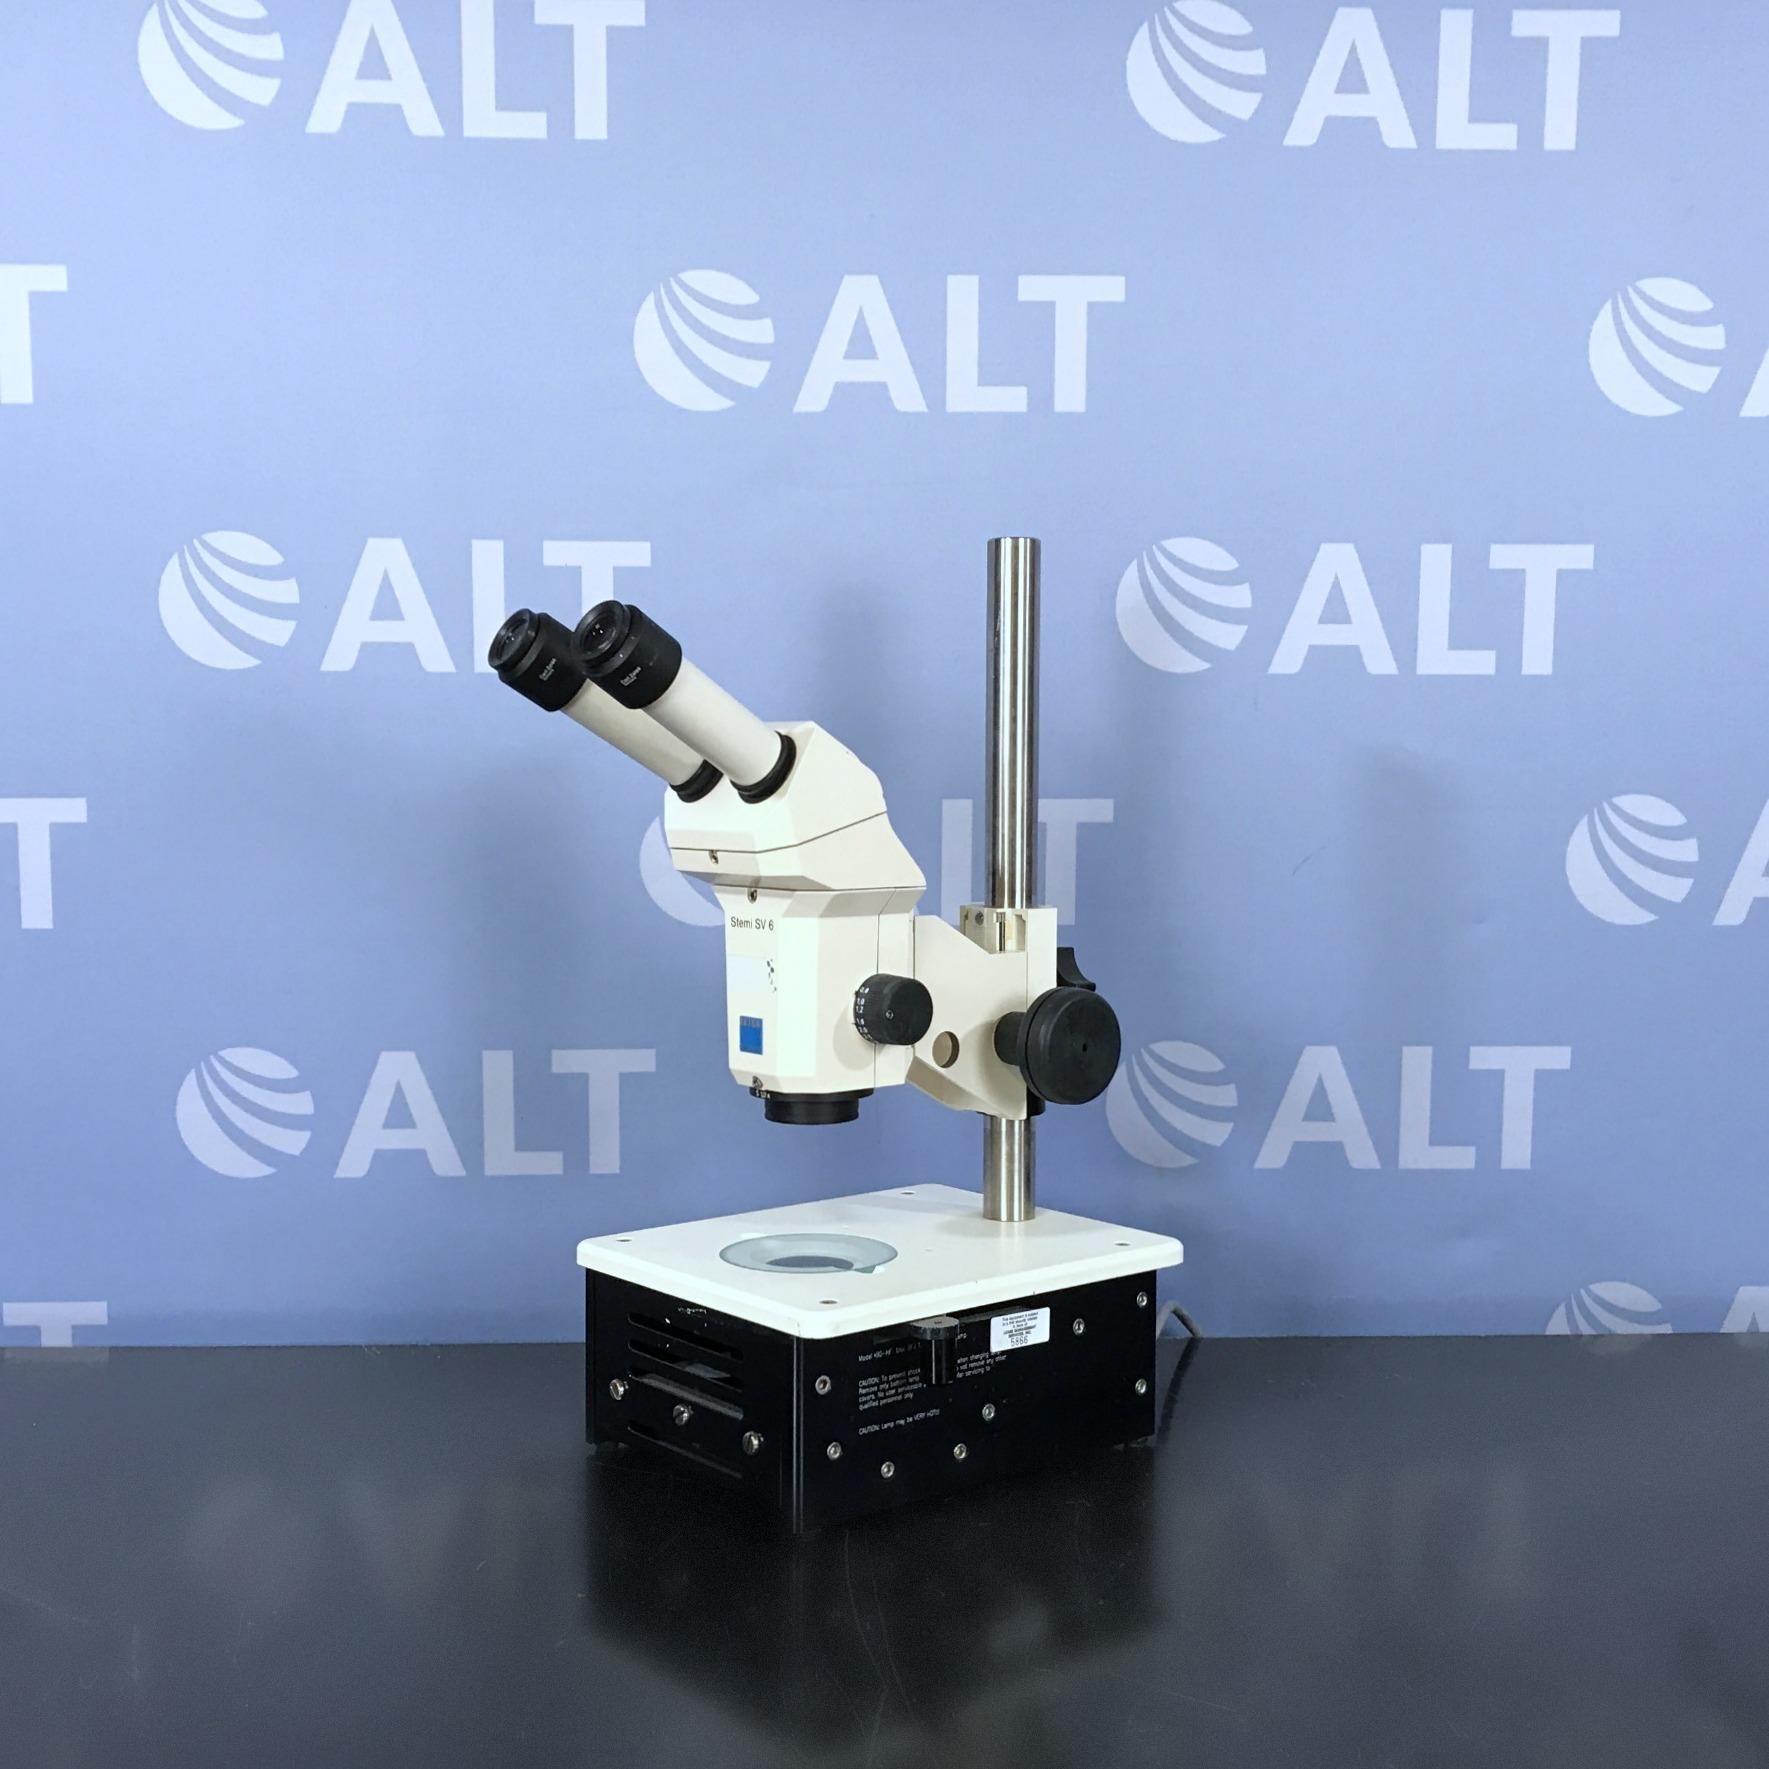 Carl Zeiss Stemi SV6 Stereomicroscope Image